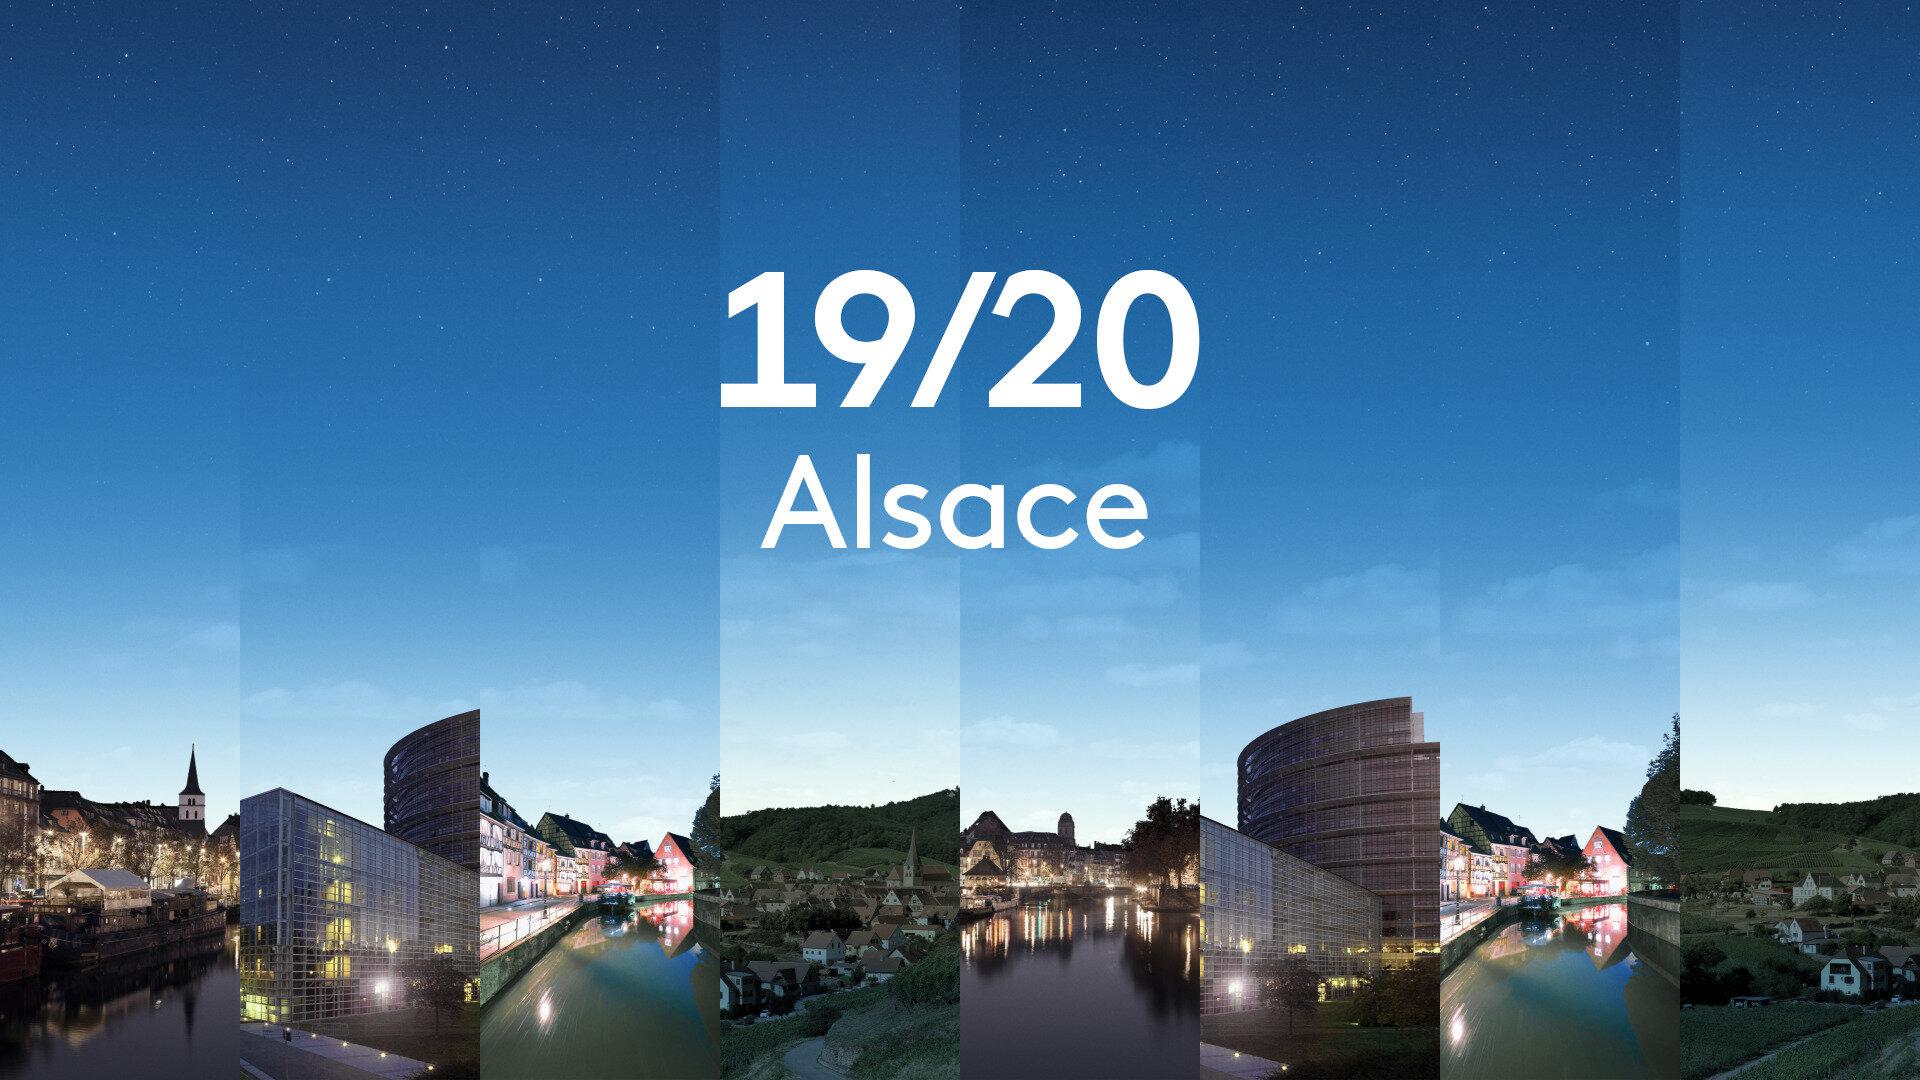 19/20 Alsace